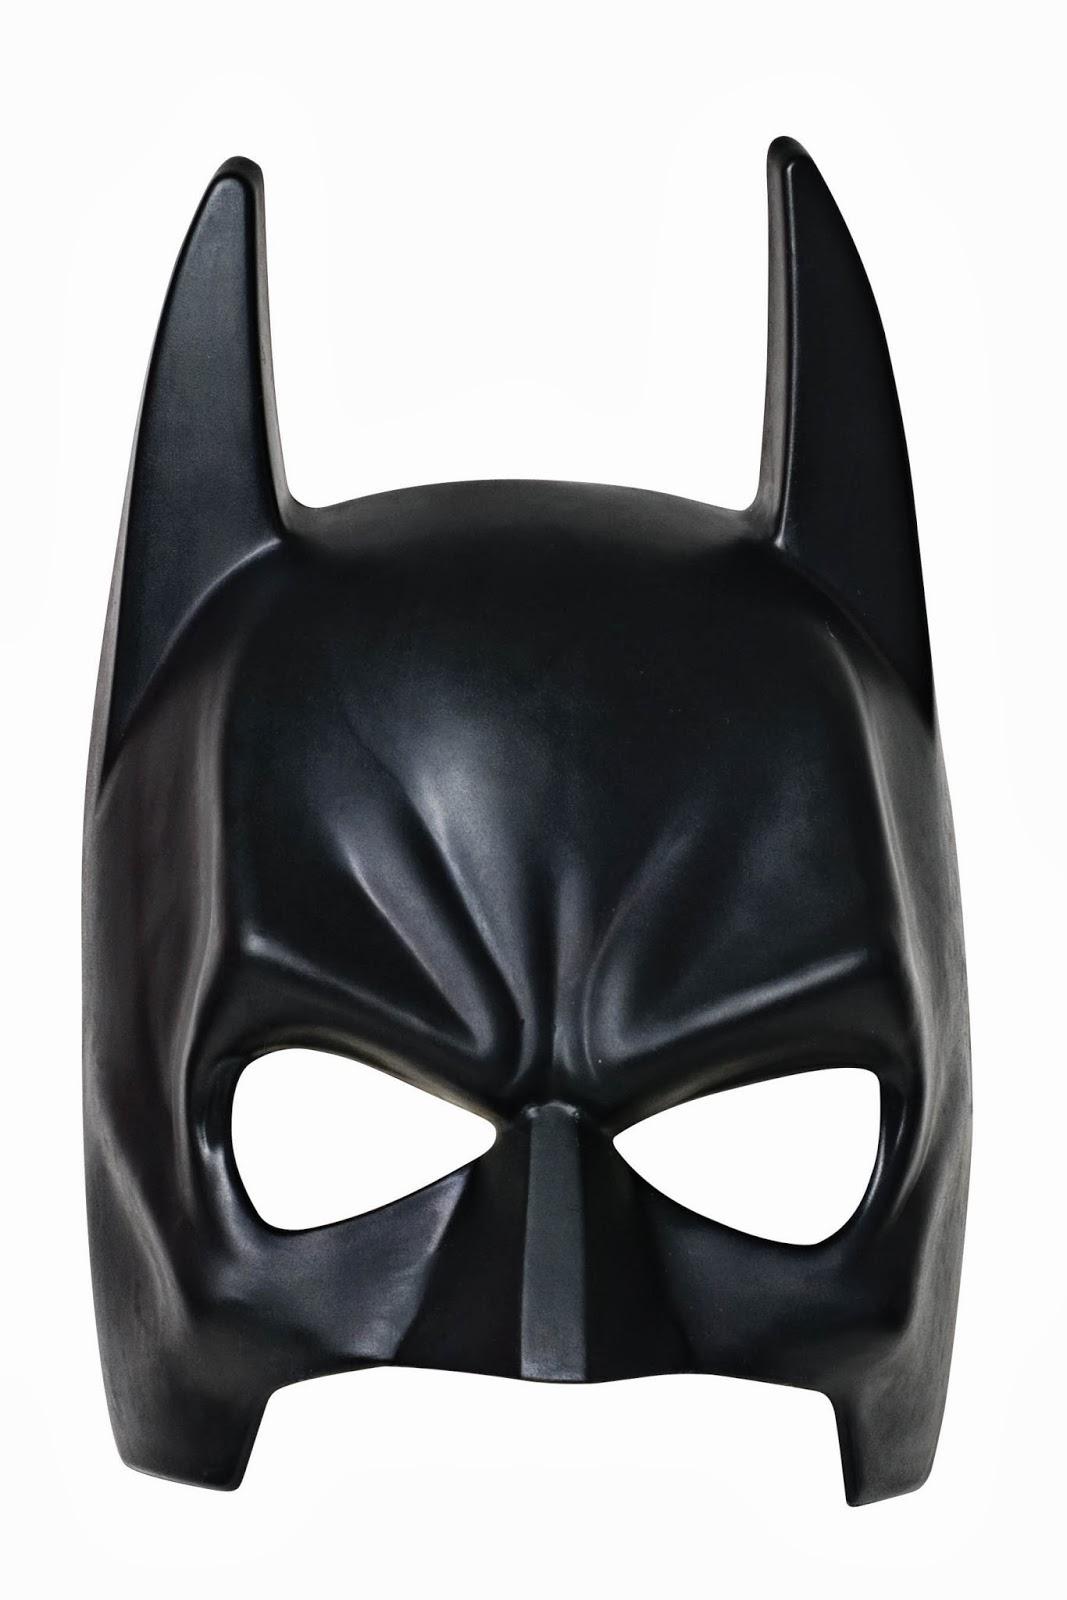 Mask clipart batgirl Batgirl me Masks Free Batgirl